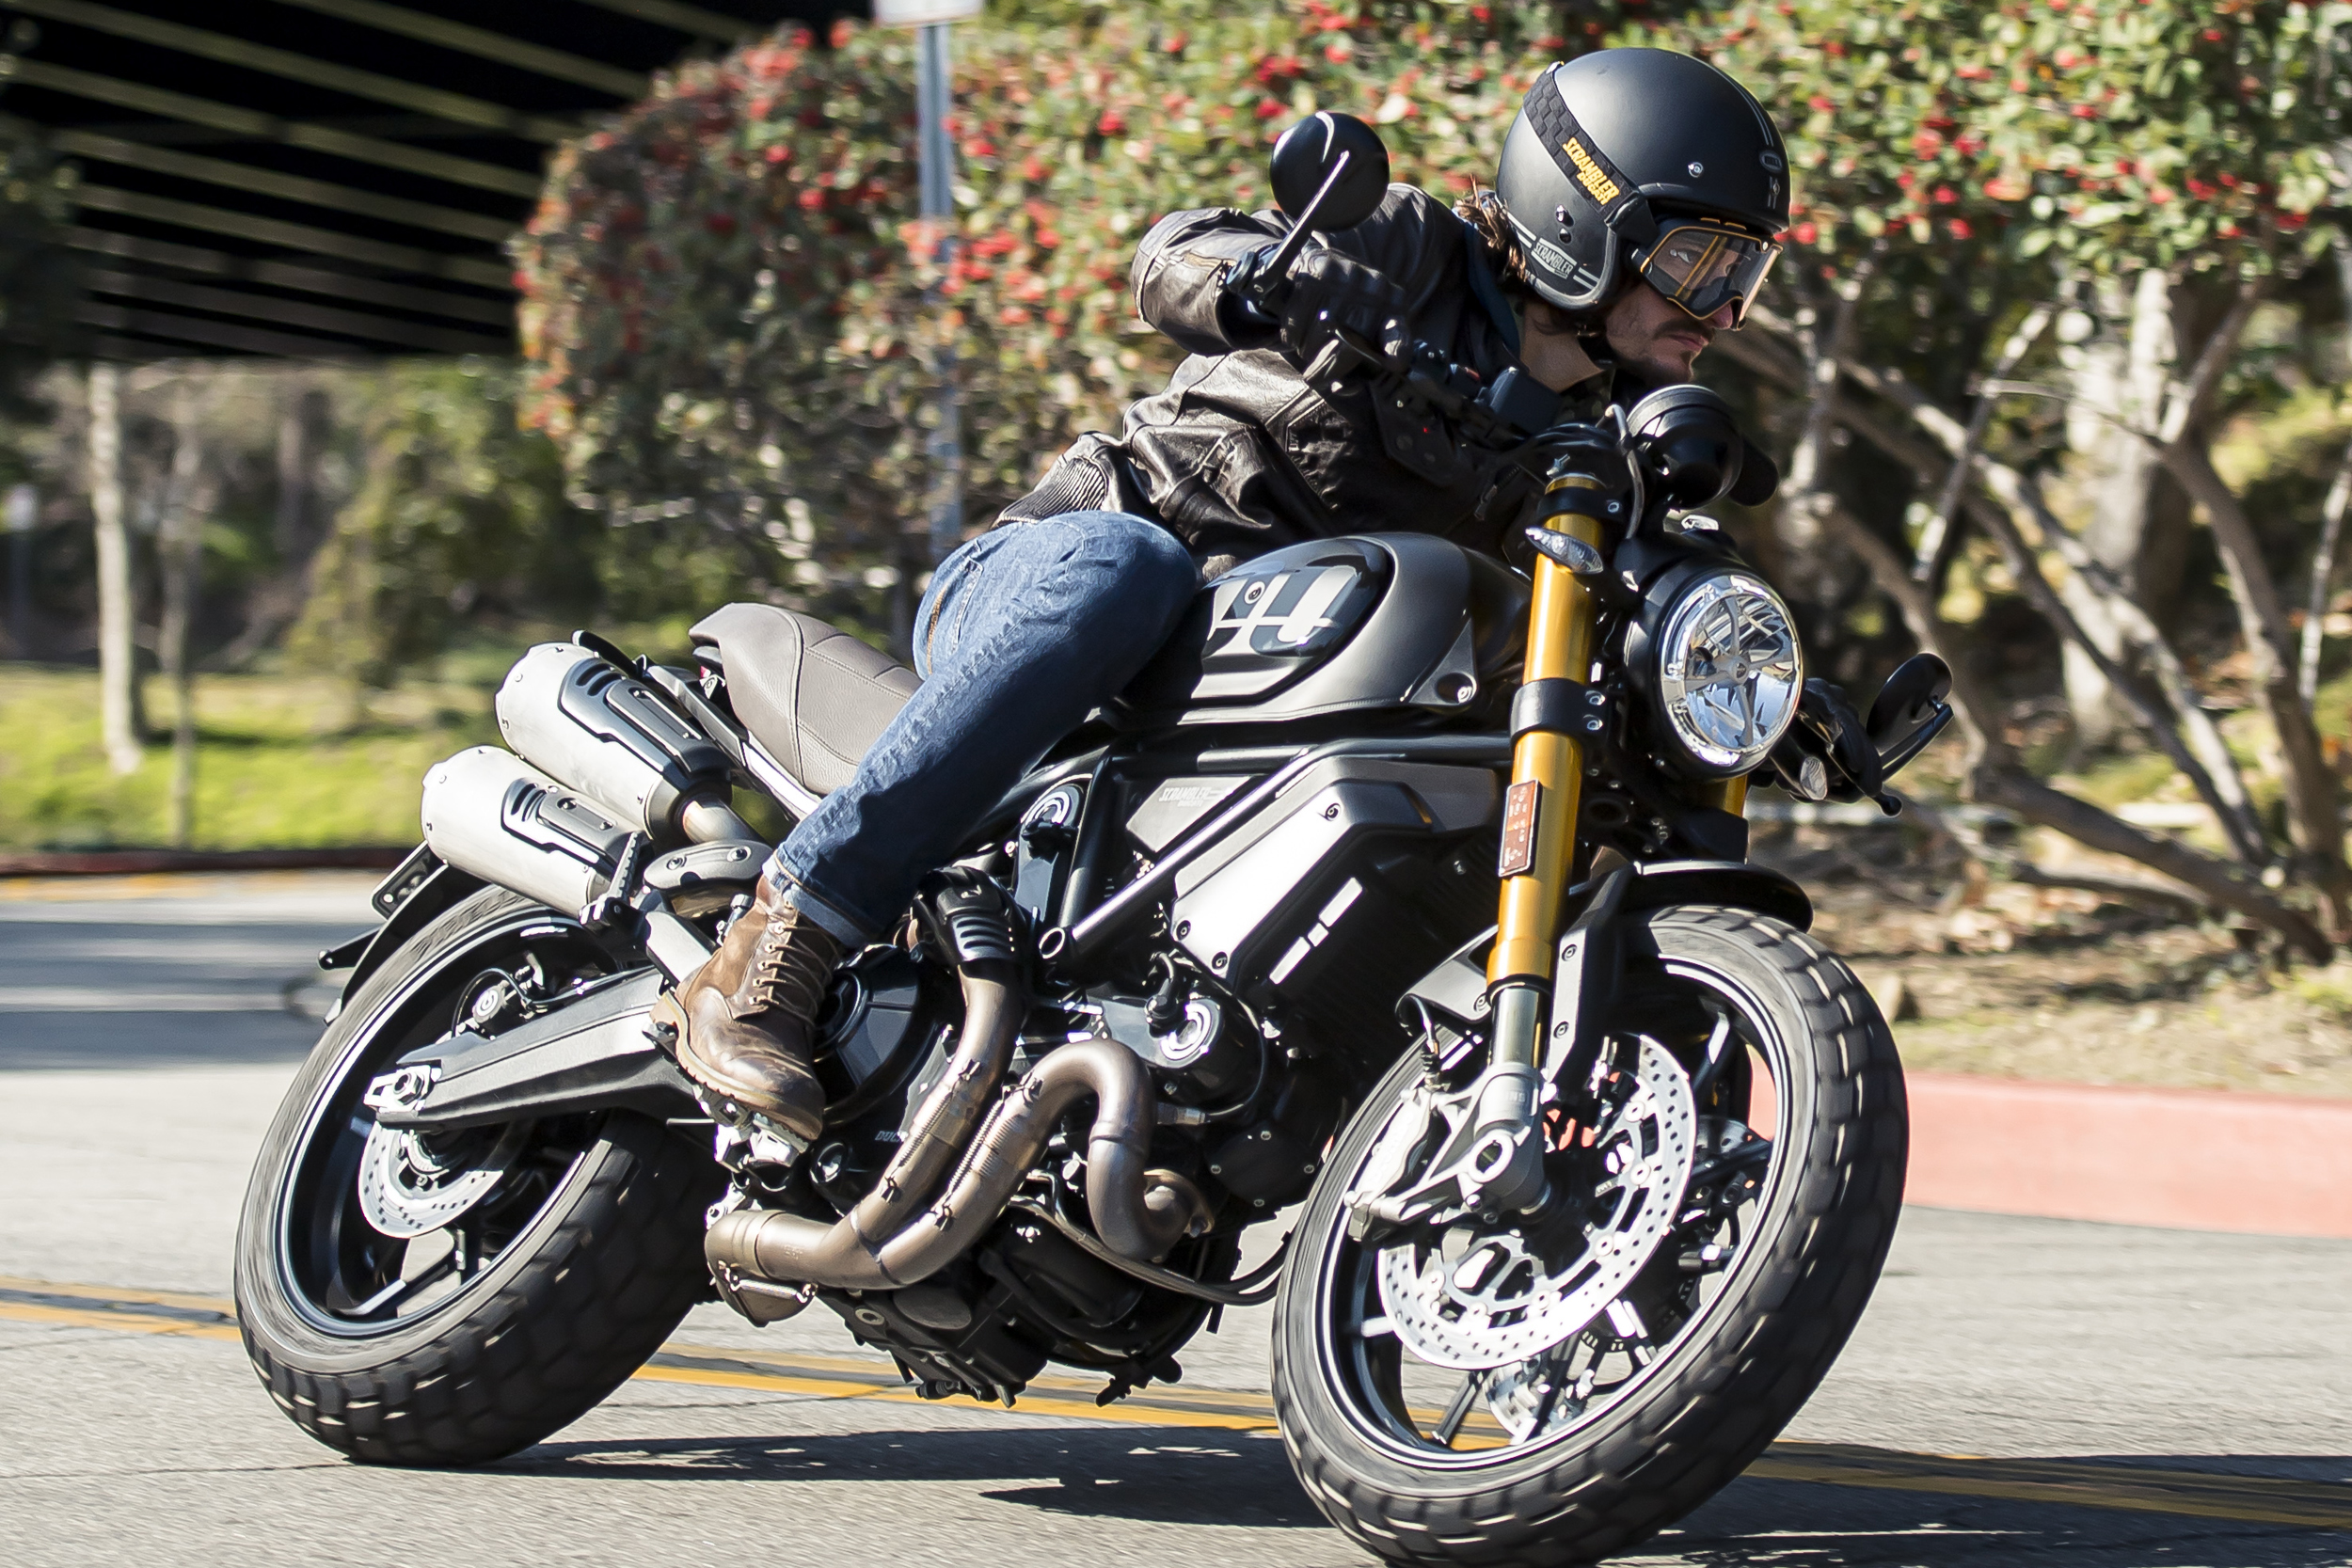 Ducati Scrambler 1100 Sport PRO [2.1]